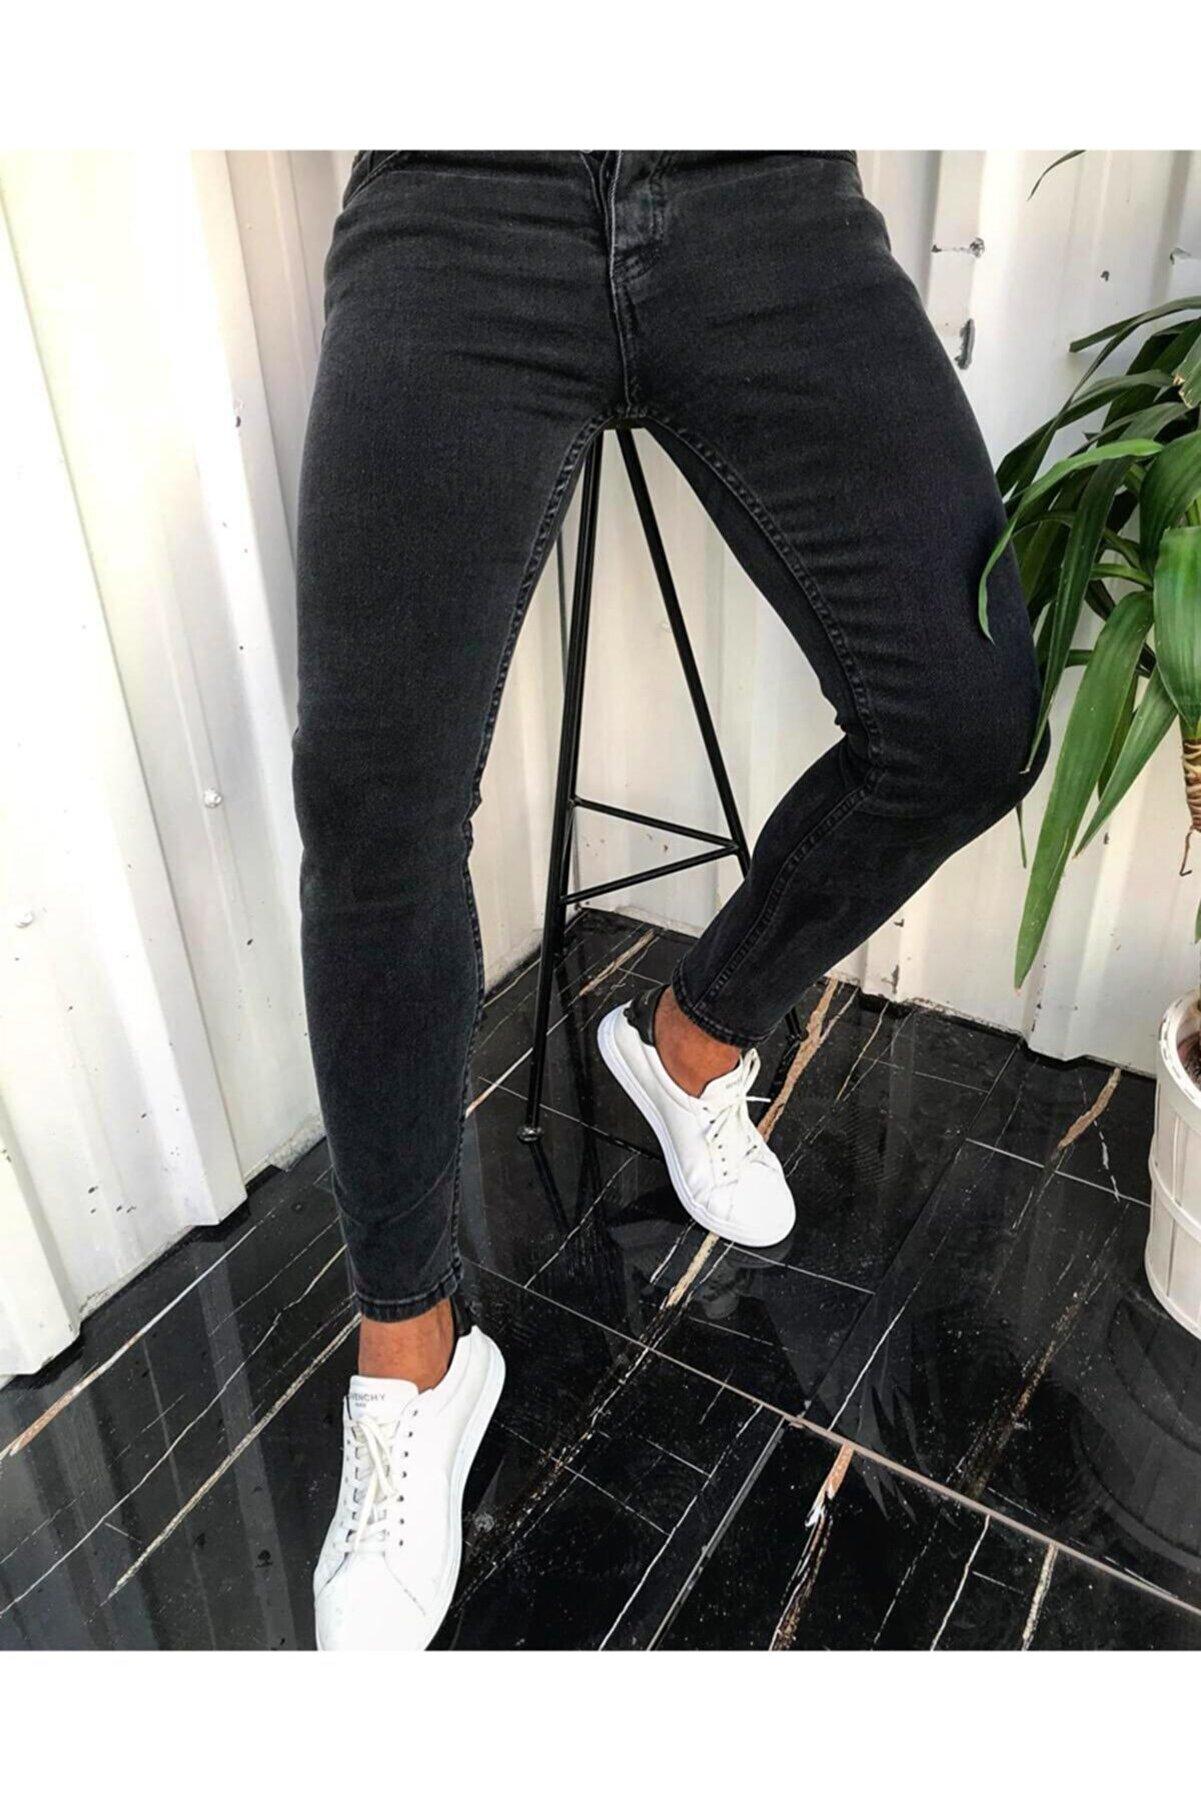 ukdwear Erkek Slim Fit Kot Pantolon